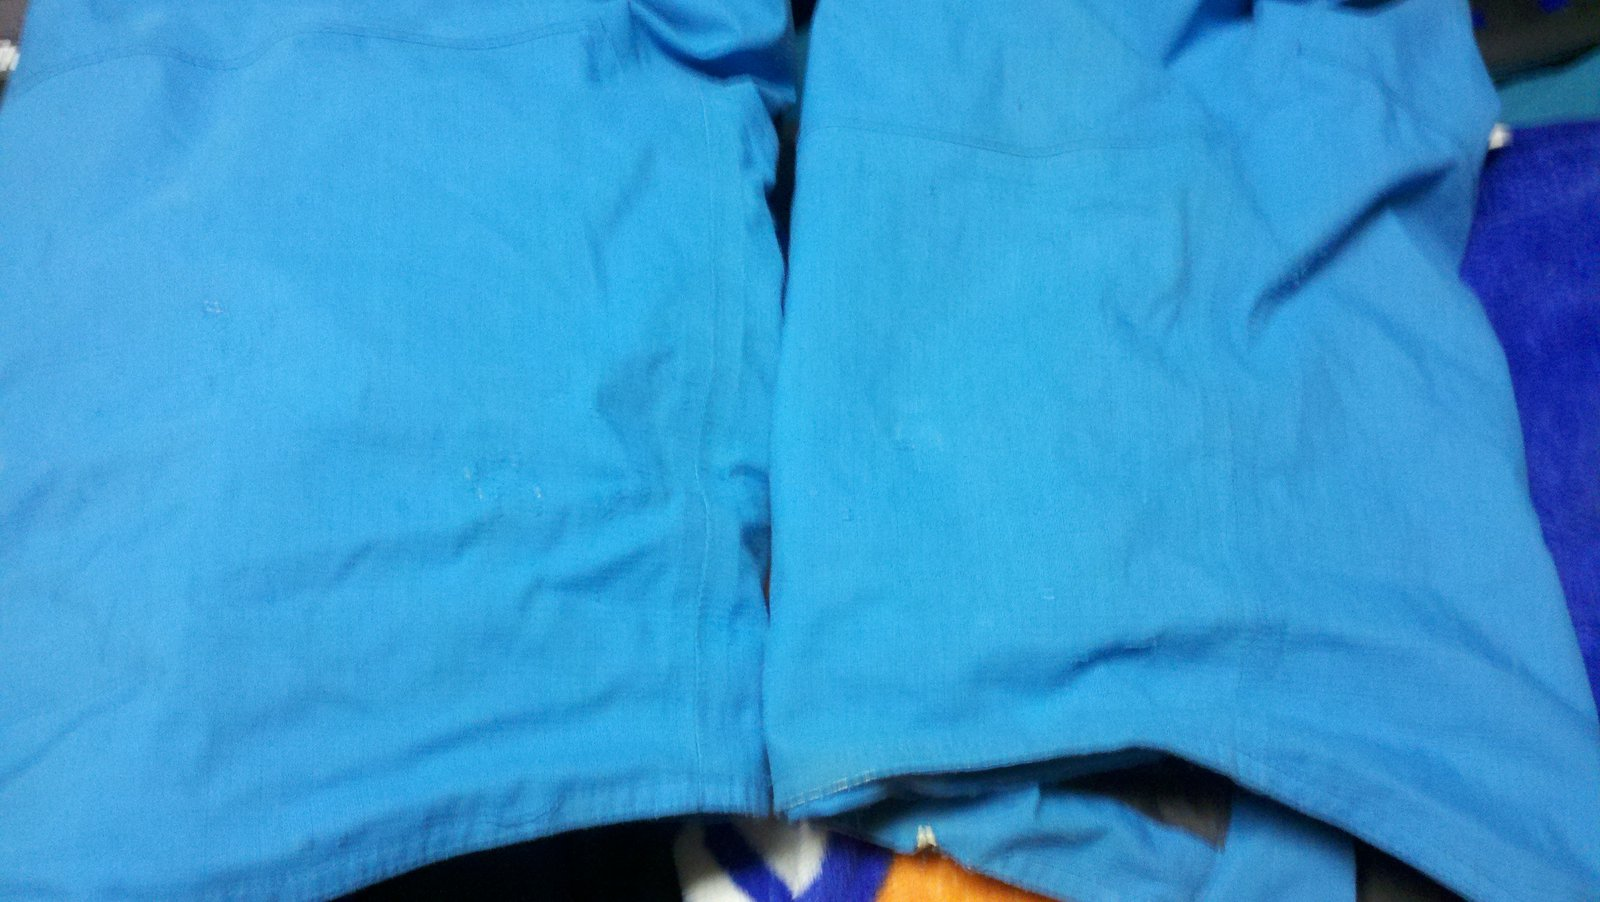 inside pants